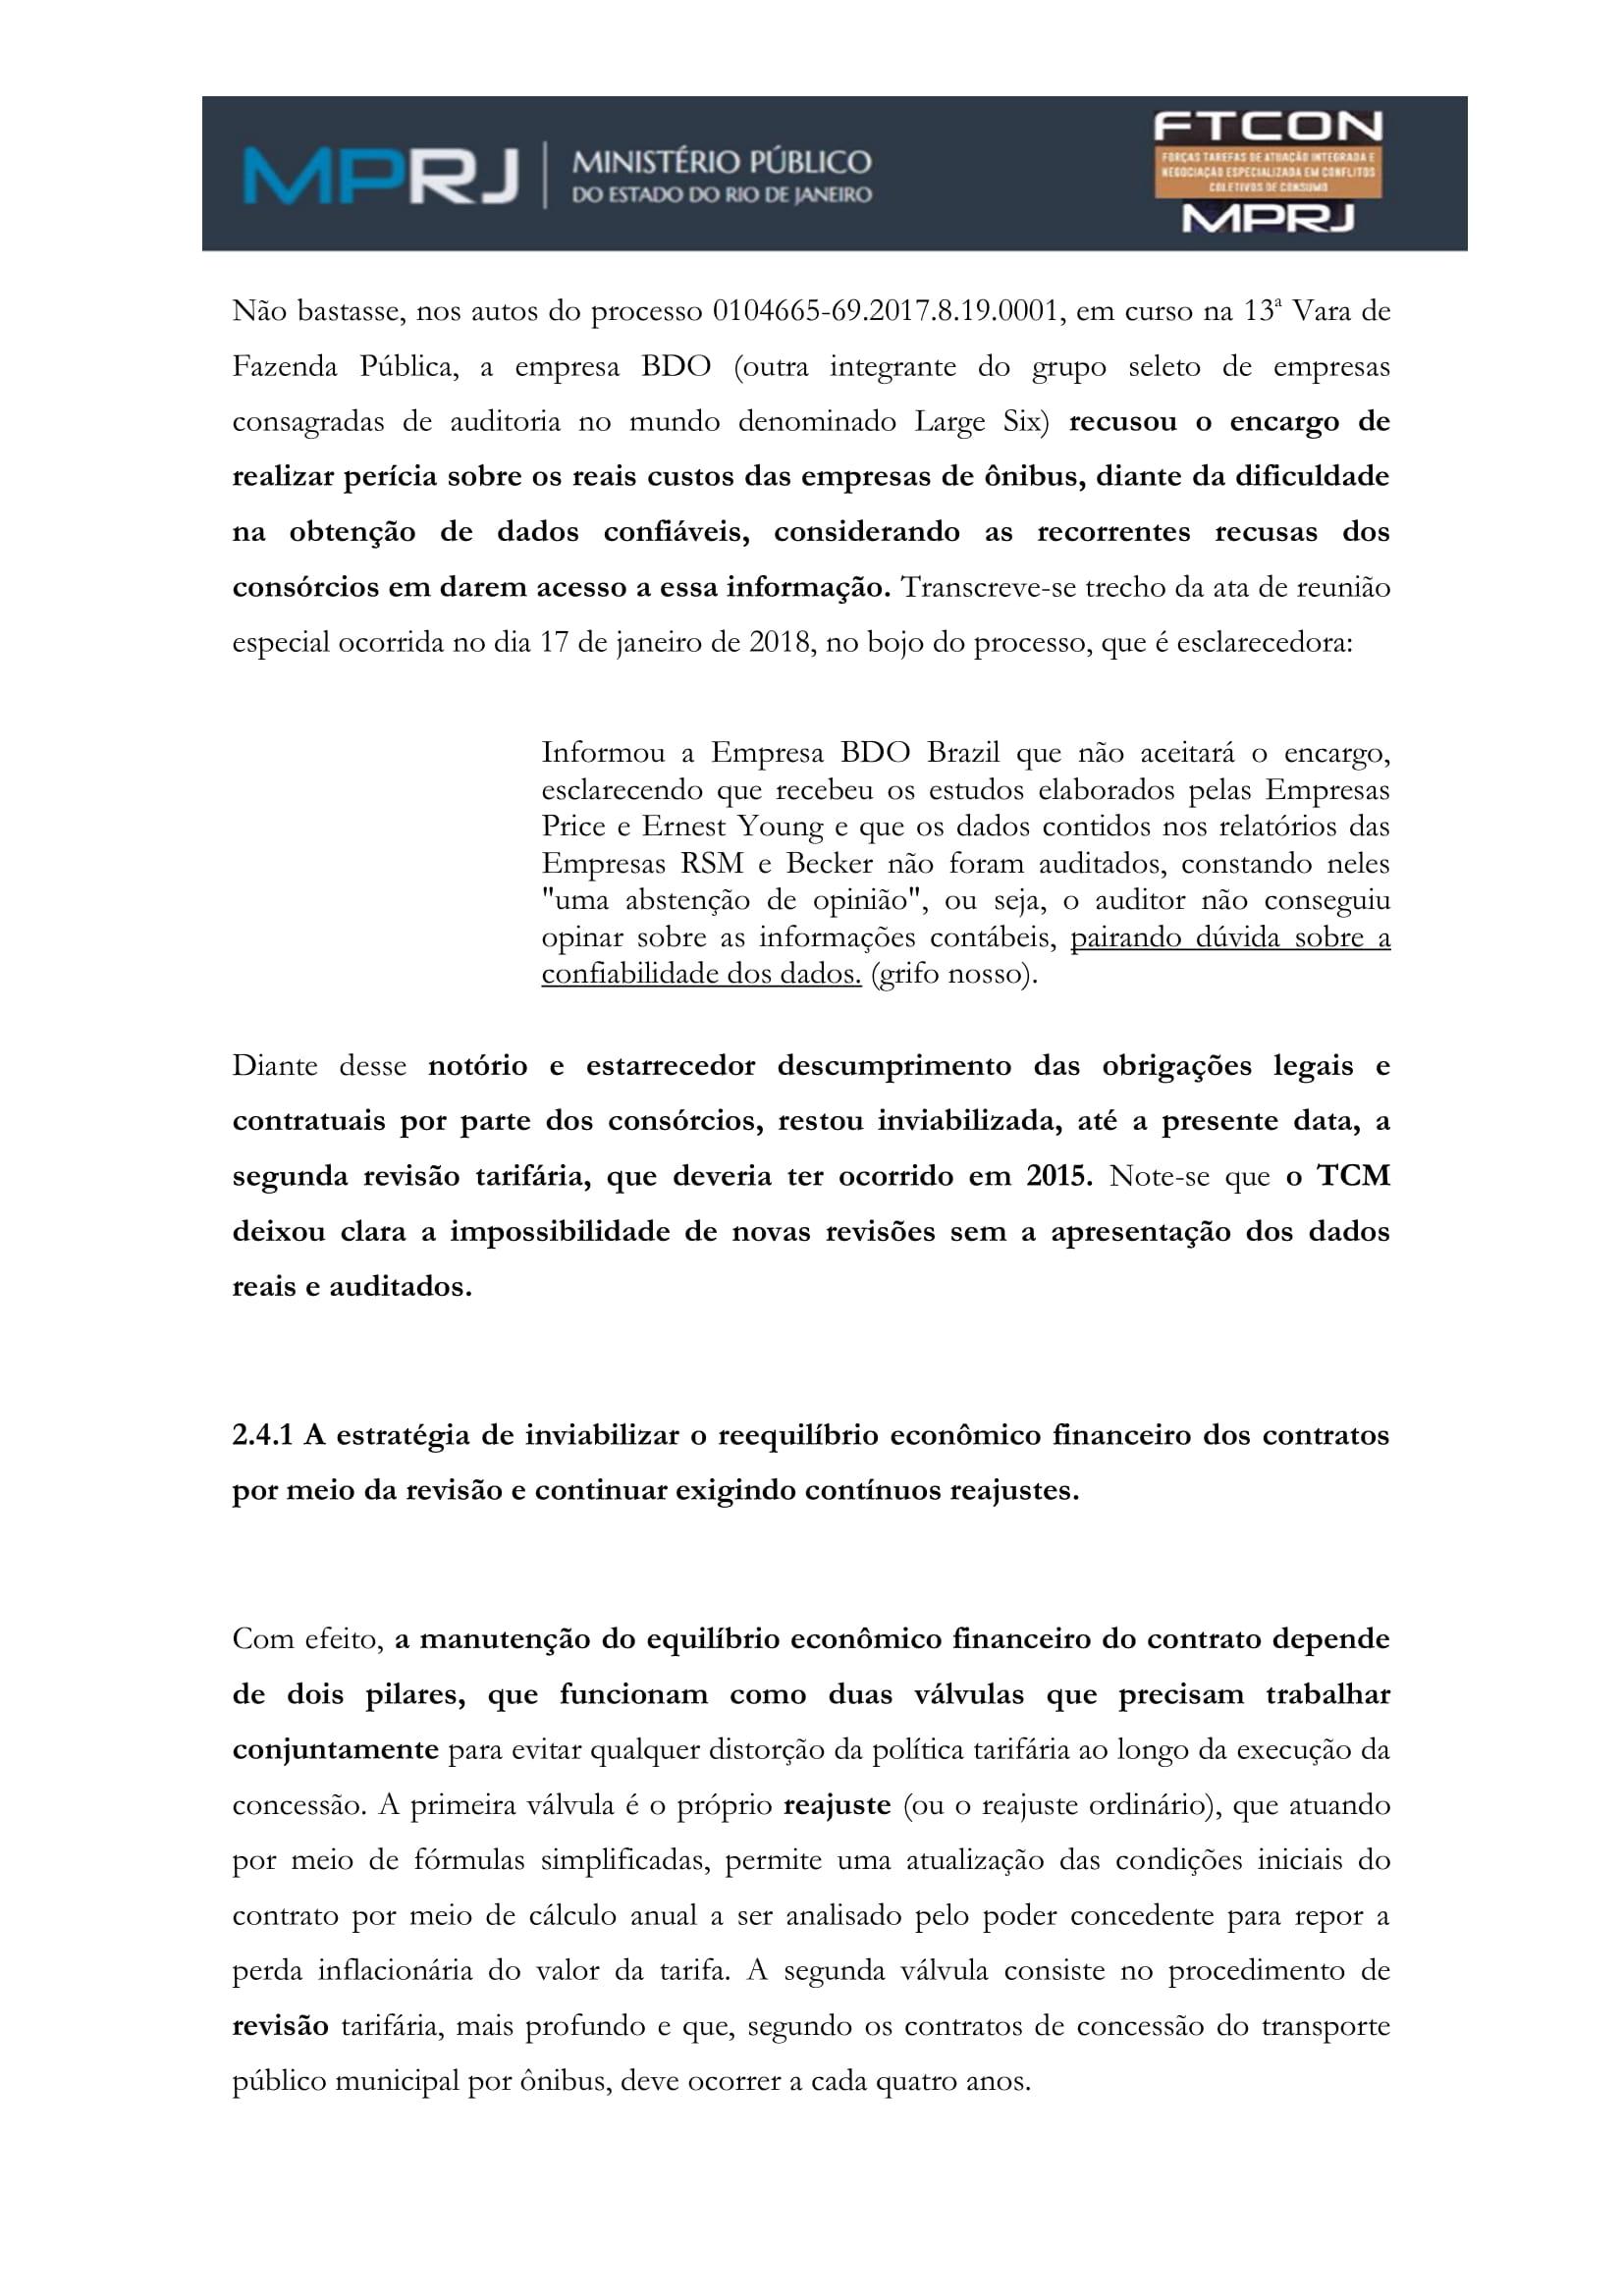 acp_caducidade_onibus_dr_rt-050